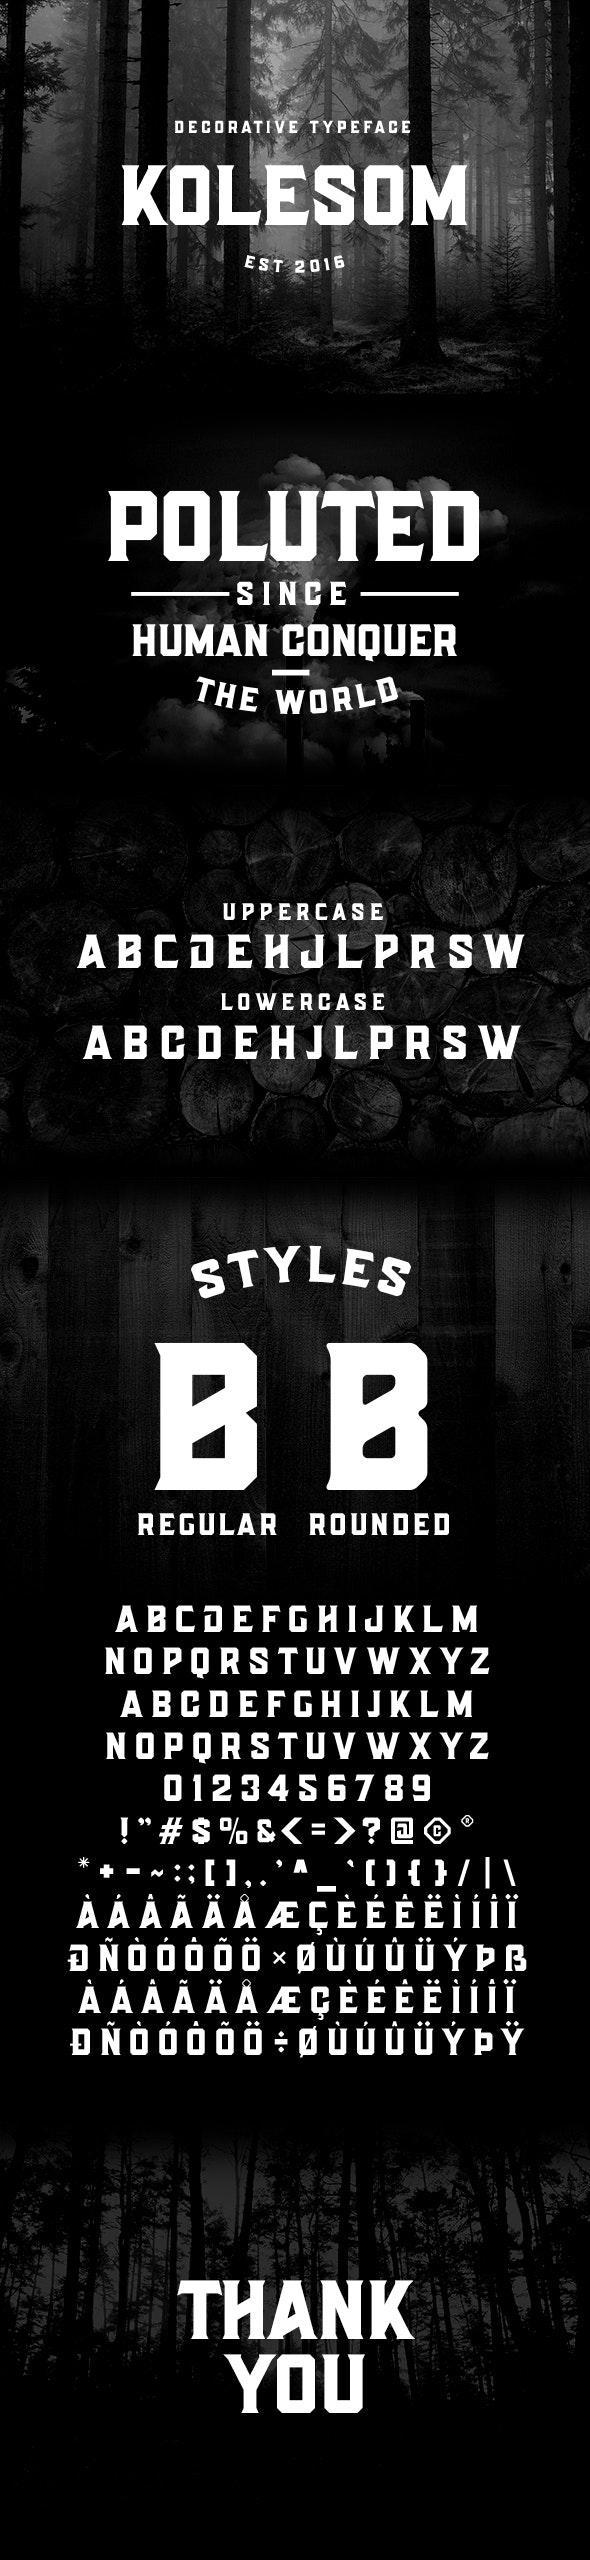 Kolesom Typeface - Cool Fonts